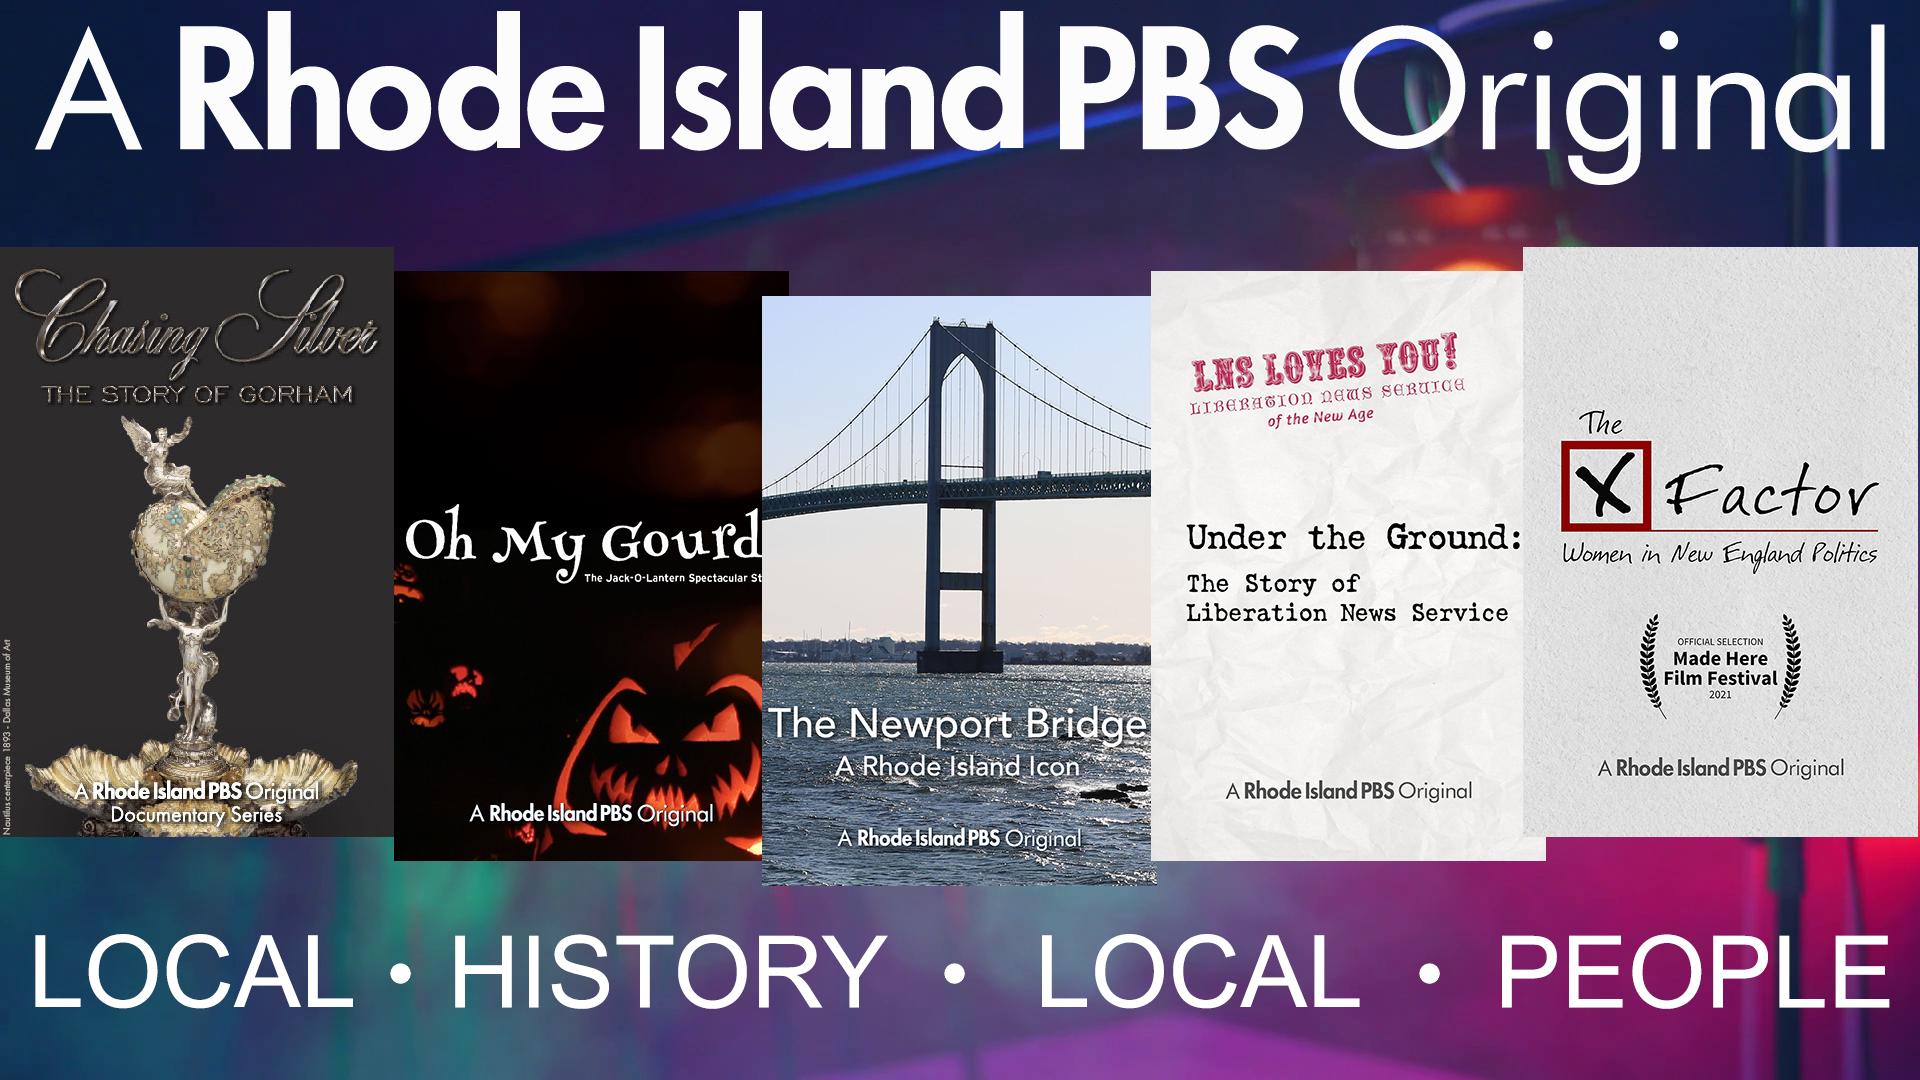 Rhode Island PBS Original Documentaries